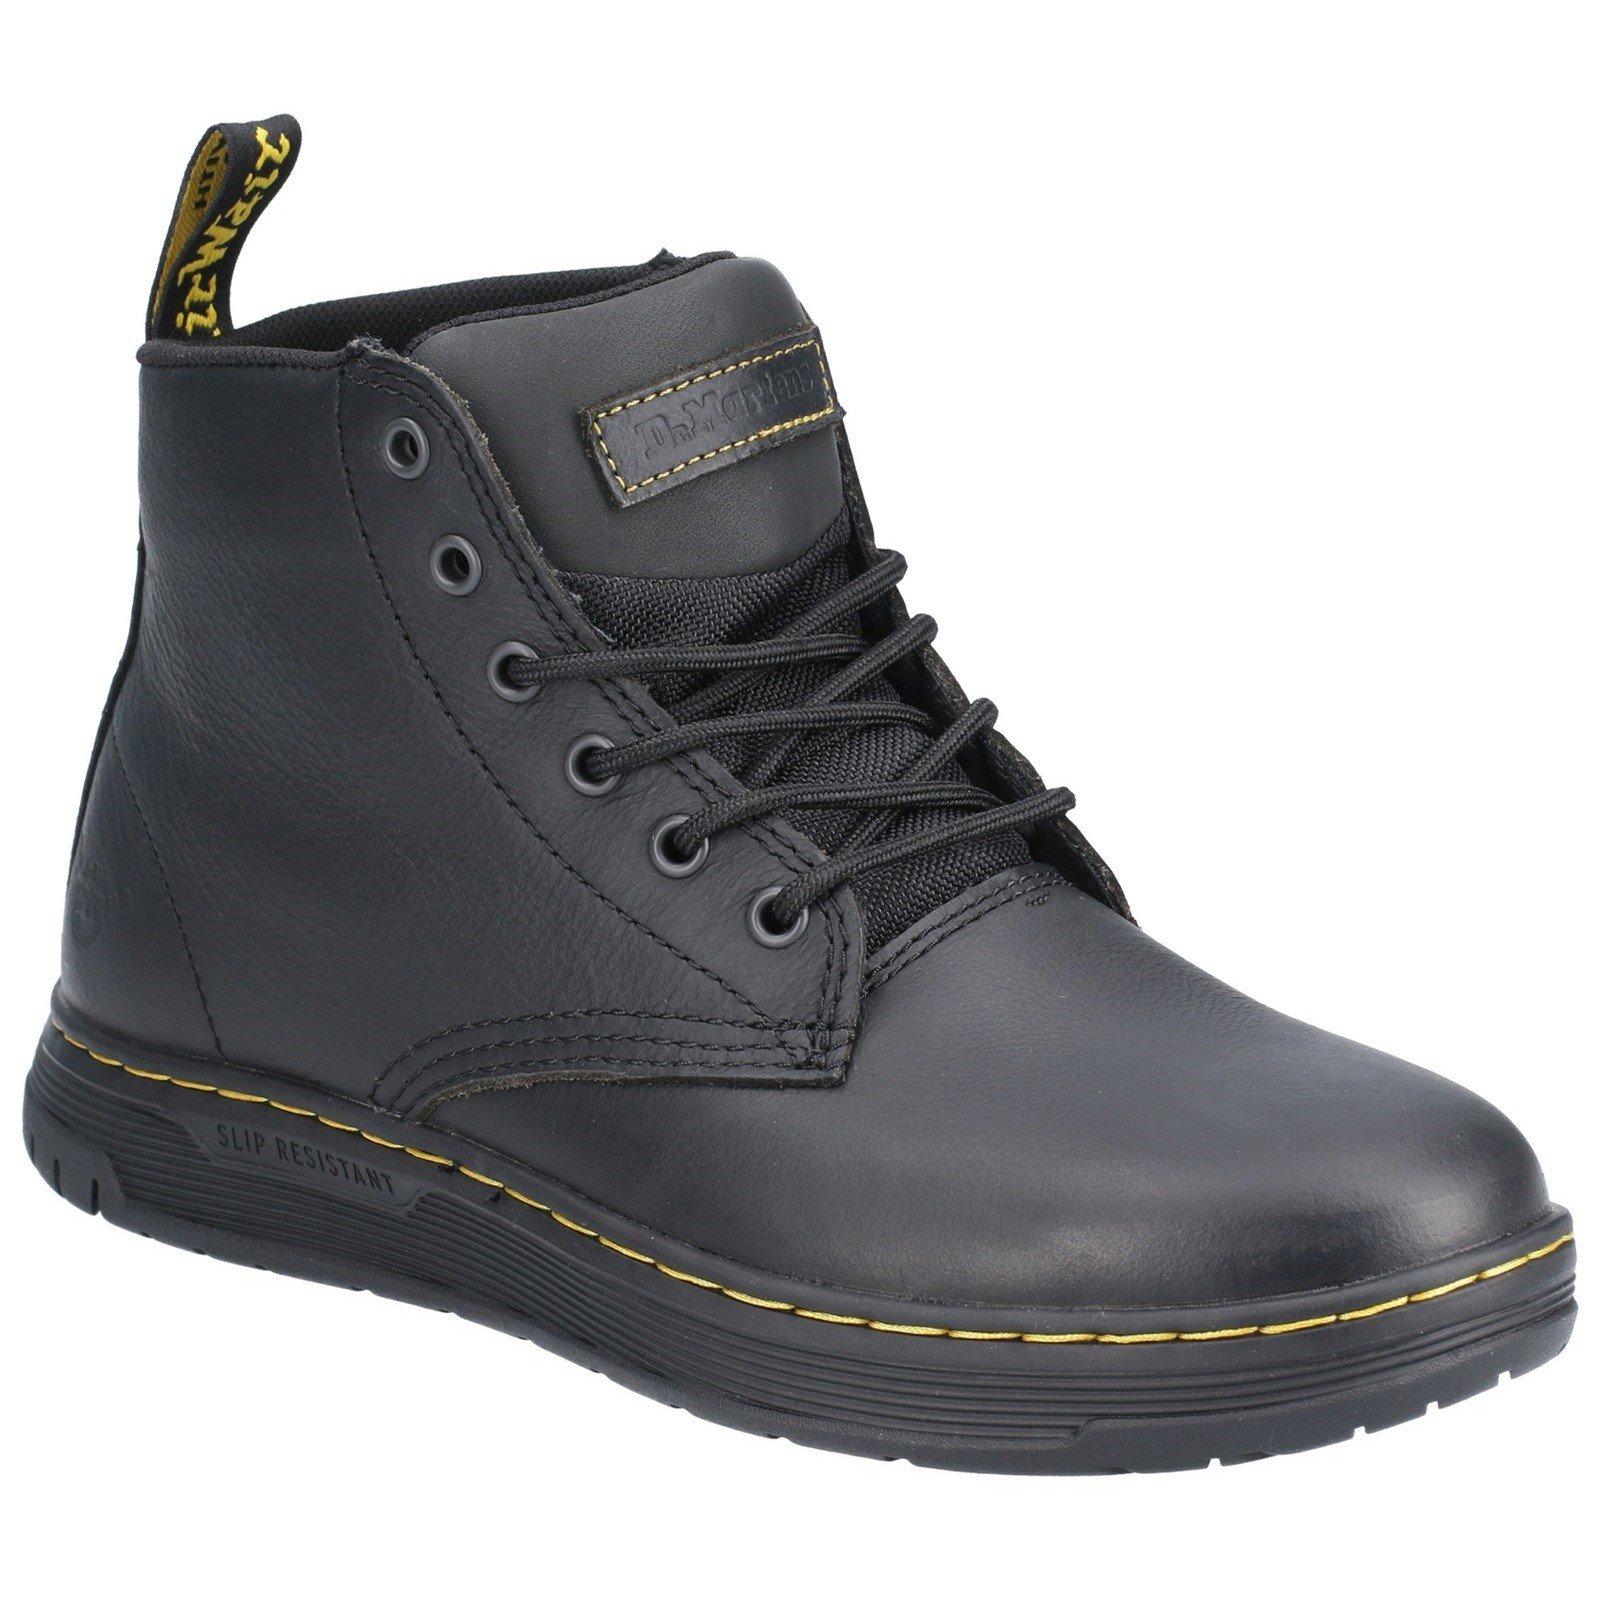 Dr Martens Men's Amwell Slip Resistant Leather Boot Black 29508 - Black 9